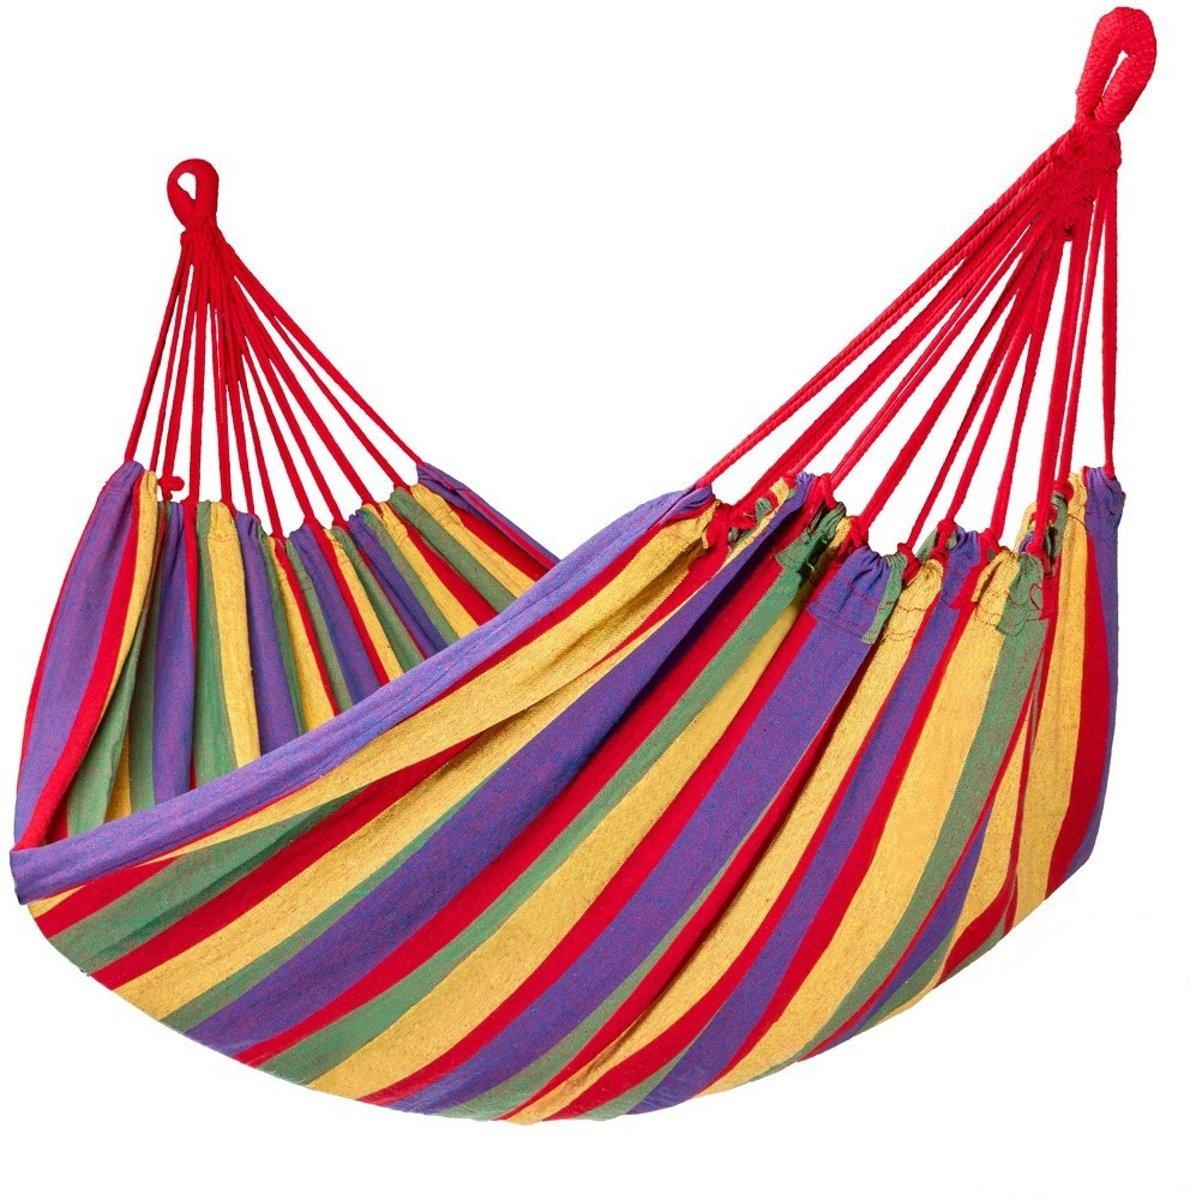 Campingwise ® 1-persoons hangmat, 190 x 80 cm. Trendy model 2019. Gratis draagzak en ophangkoorden.